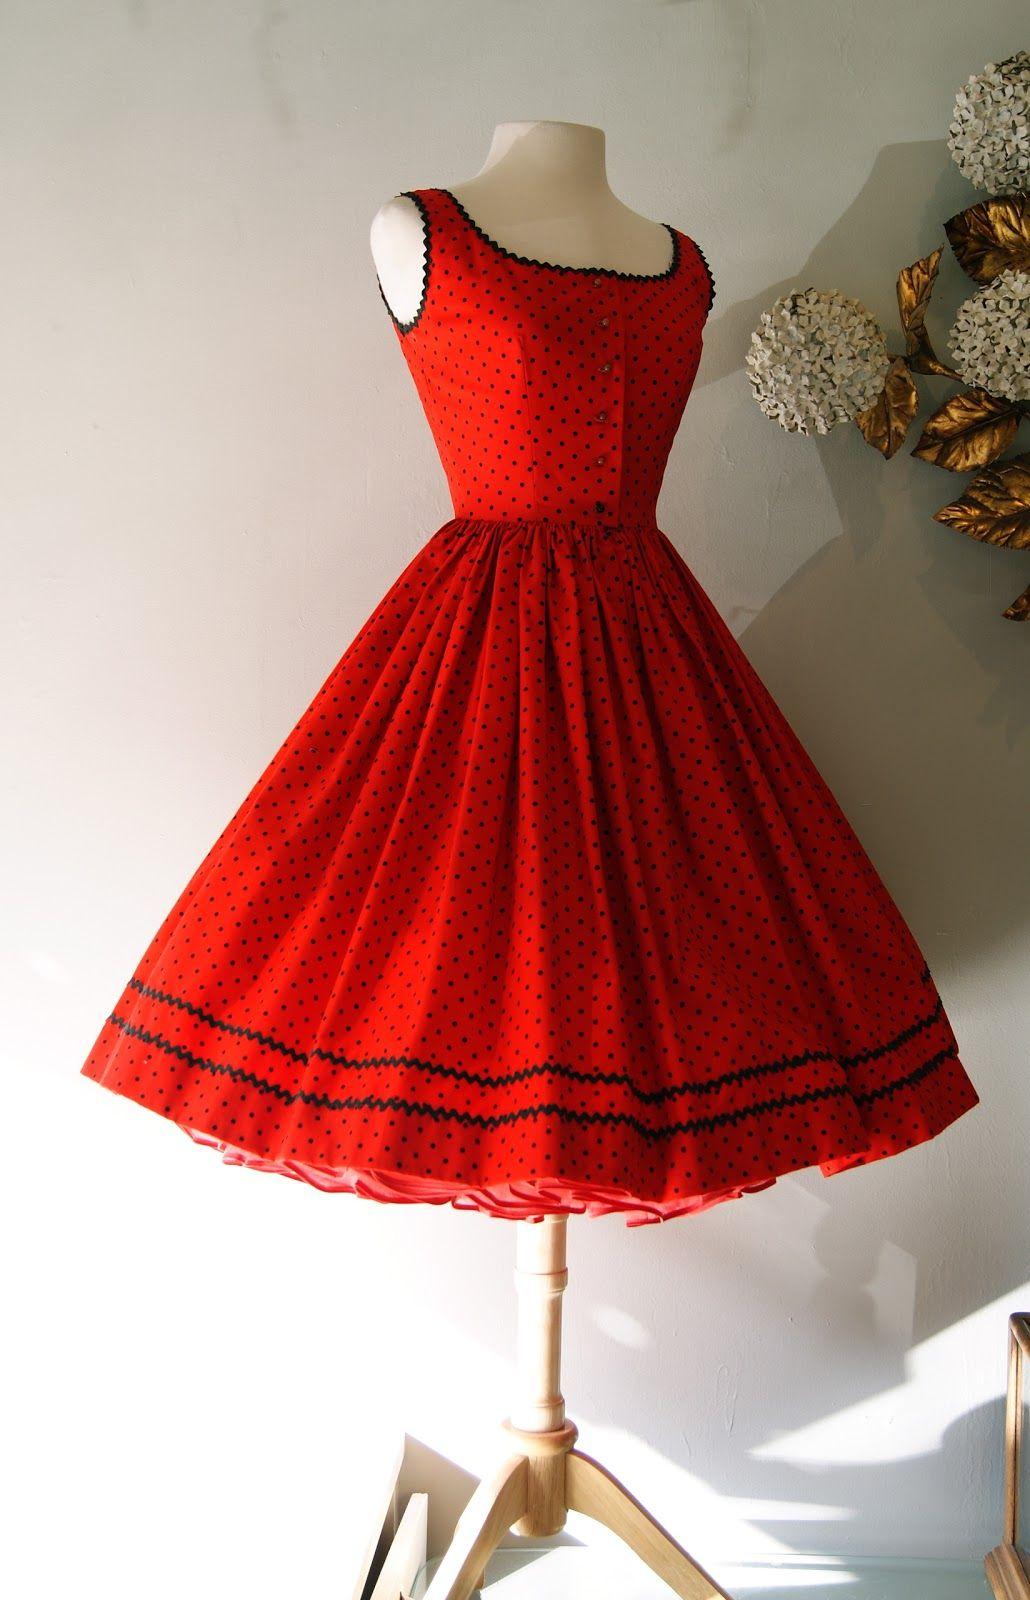 Xtabay Vintage Clothing Boutique - Portland, Oregon: Whole Lotta Lanz...